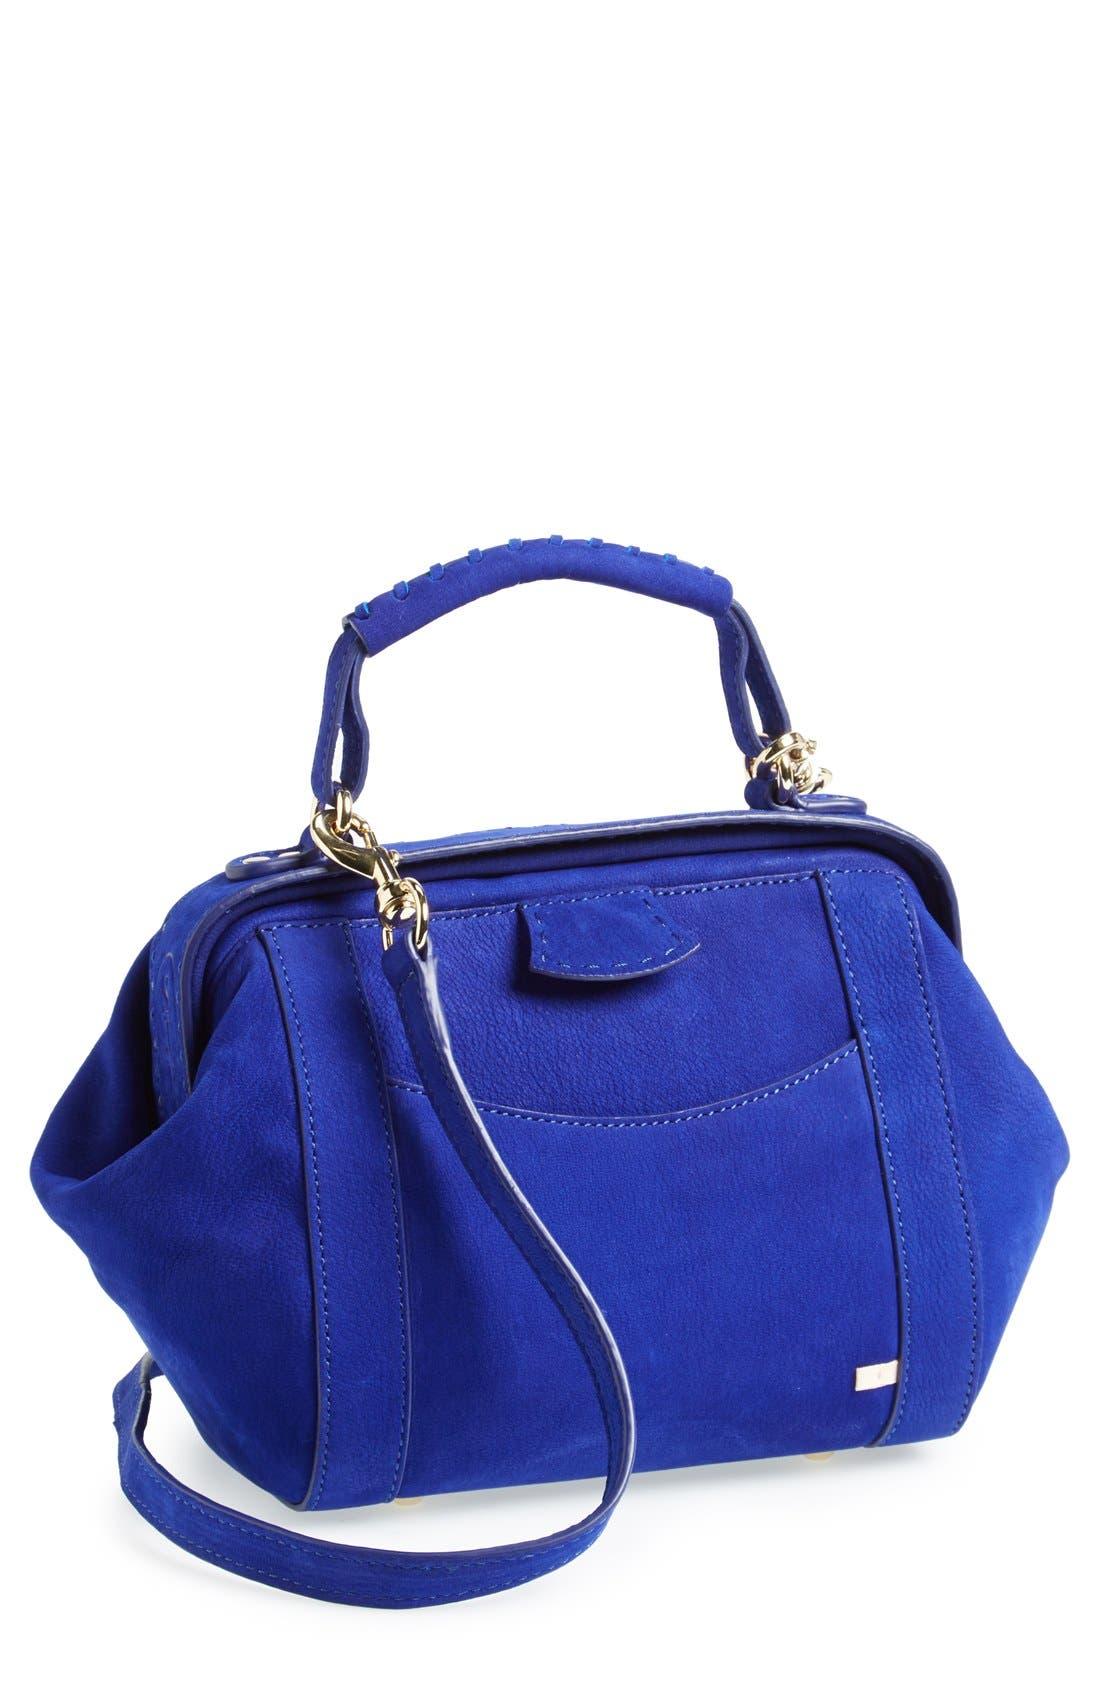 Main Image - SJP 'Waverly' Suede Crossbody Bag